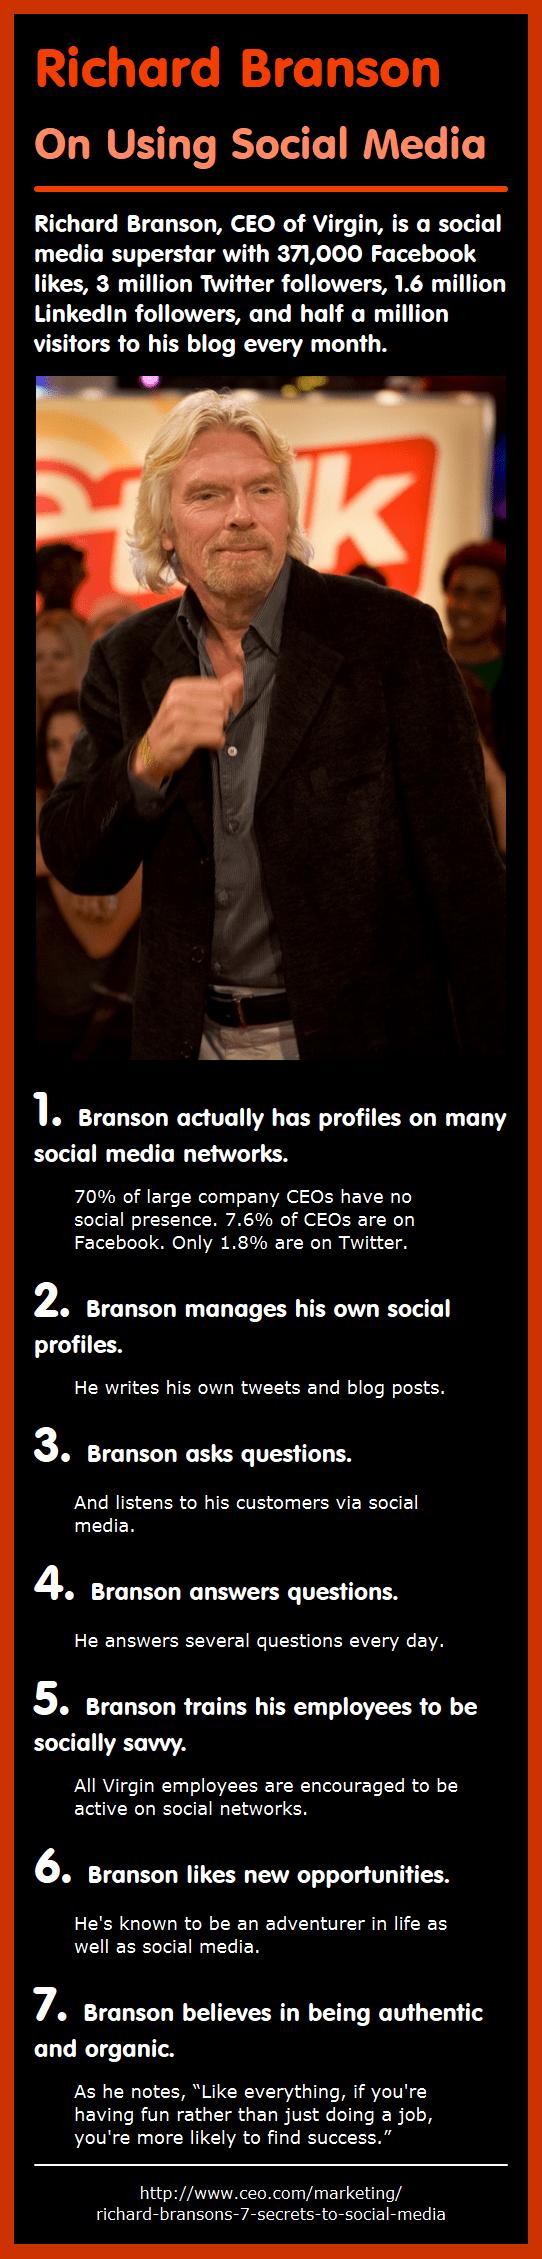 Richard Branson on Using Social Media